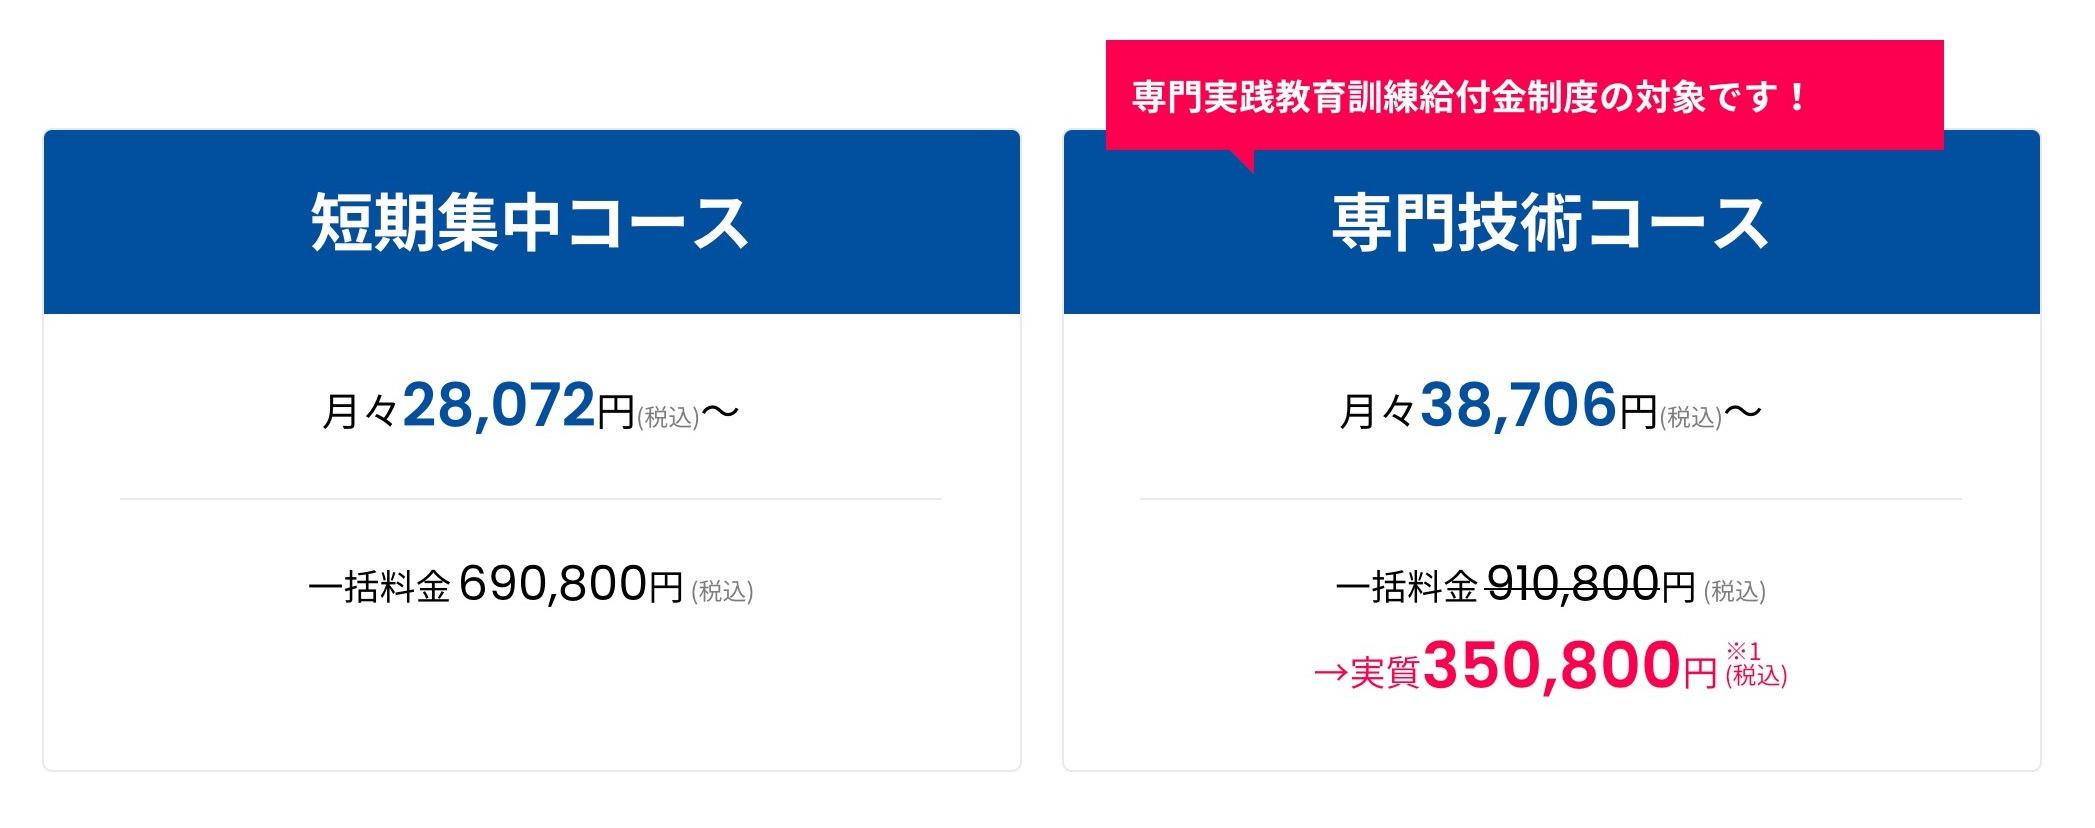 最大の56万円割引適応